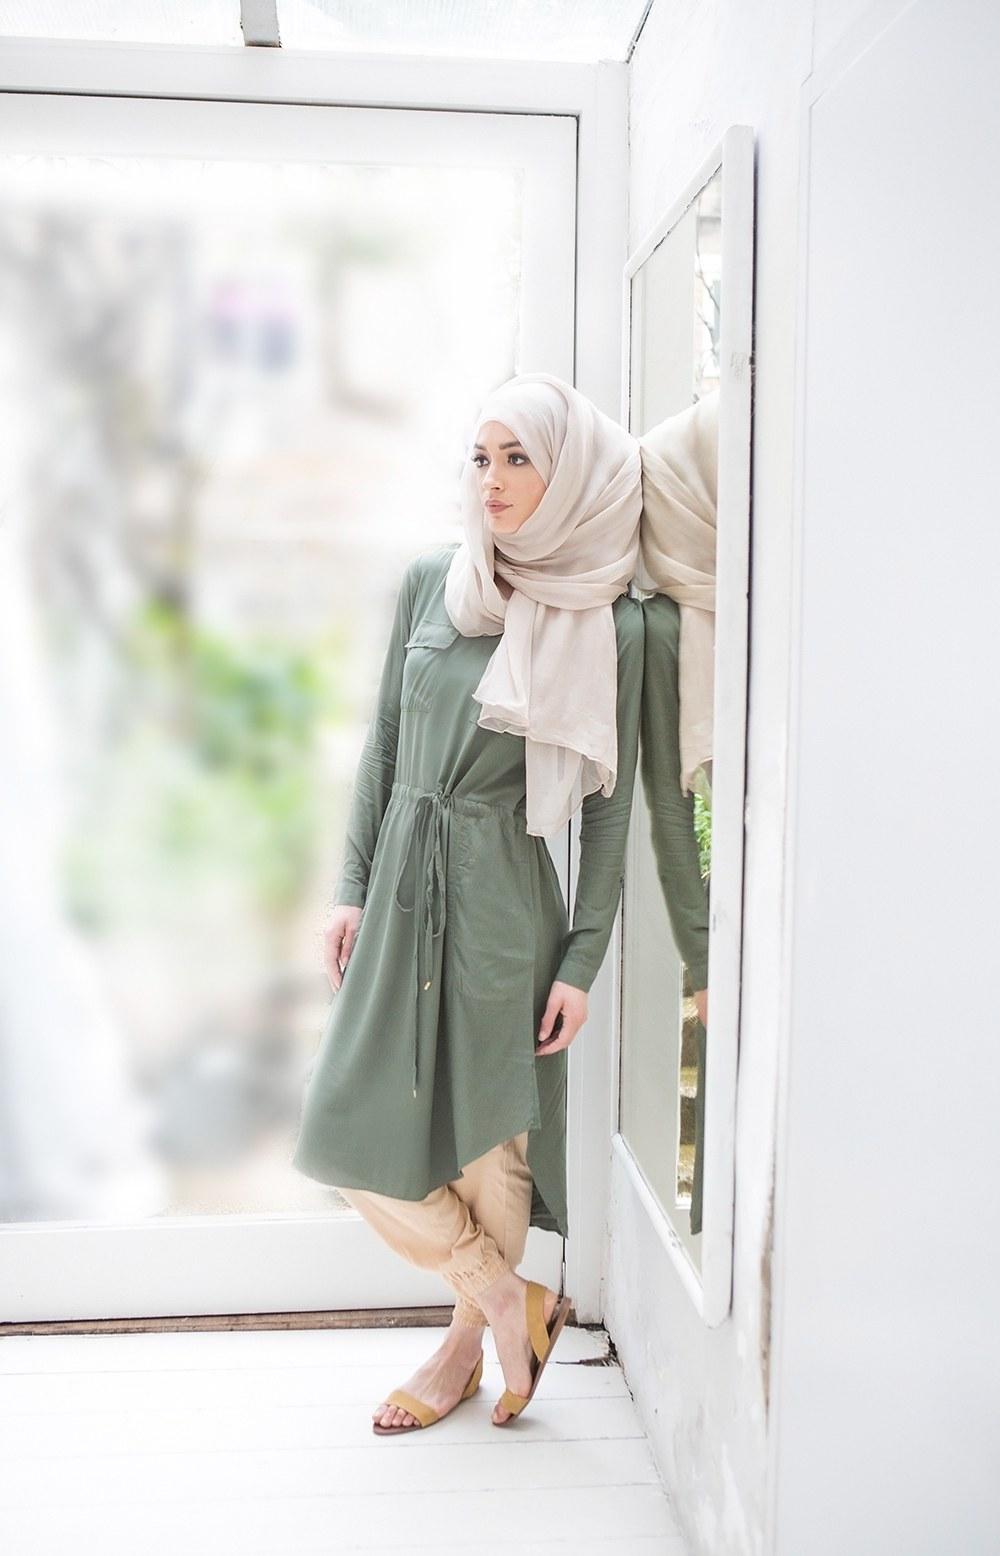 Design Baju Lebaran 2017 Kvdd 25 Trend Model Baju Muslim Lebaran 2018 Simple & Modis